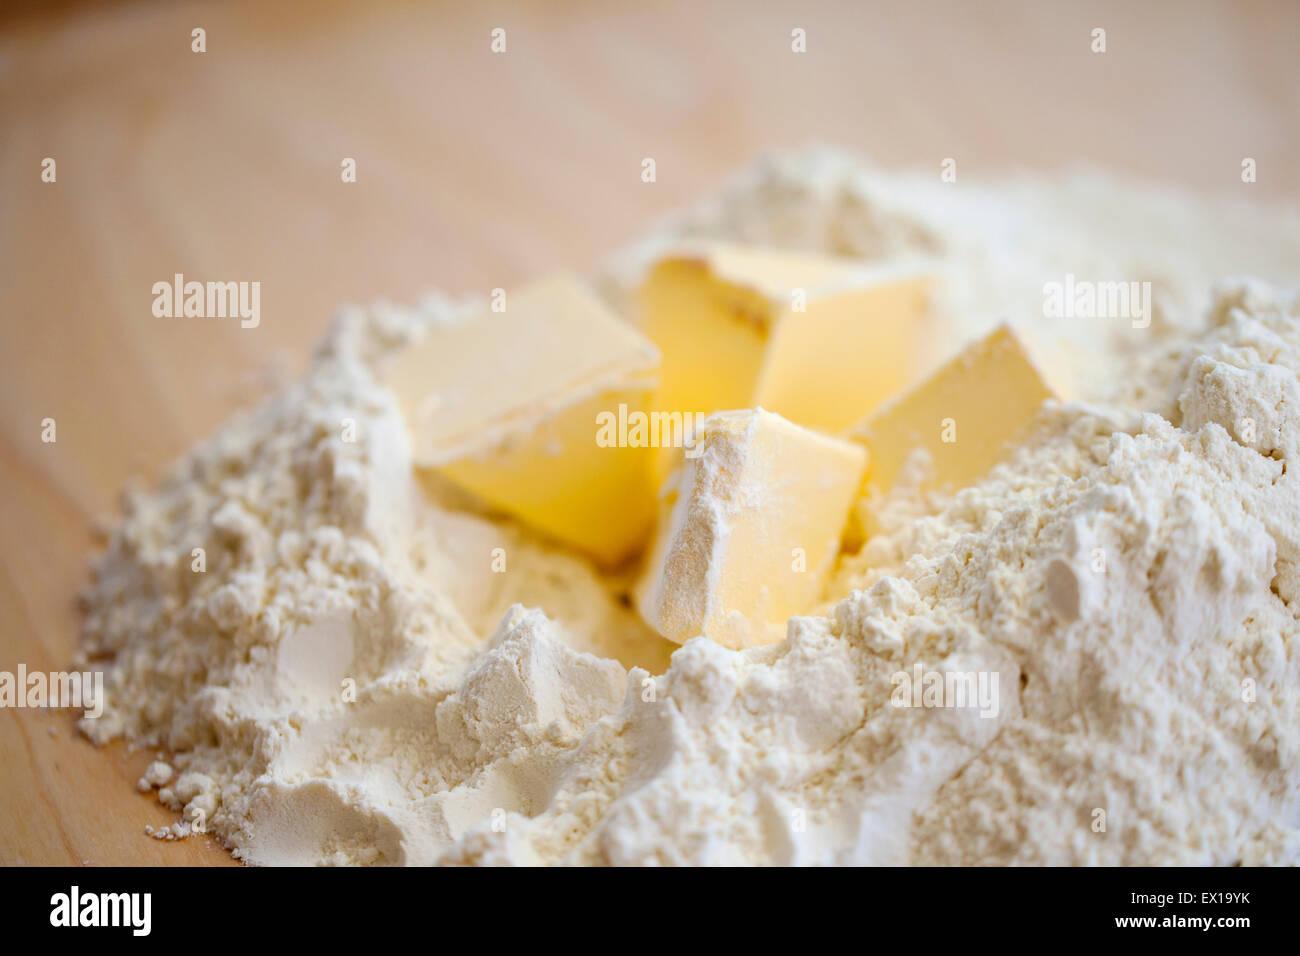 Harina y mantequilla. Imagen De Stock